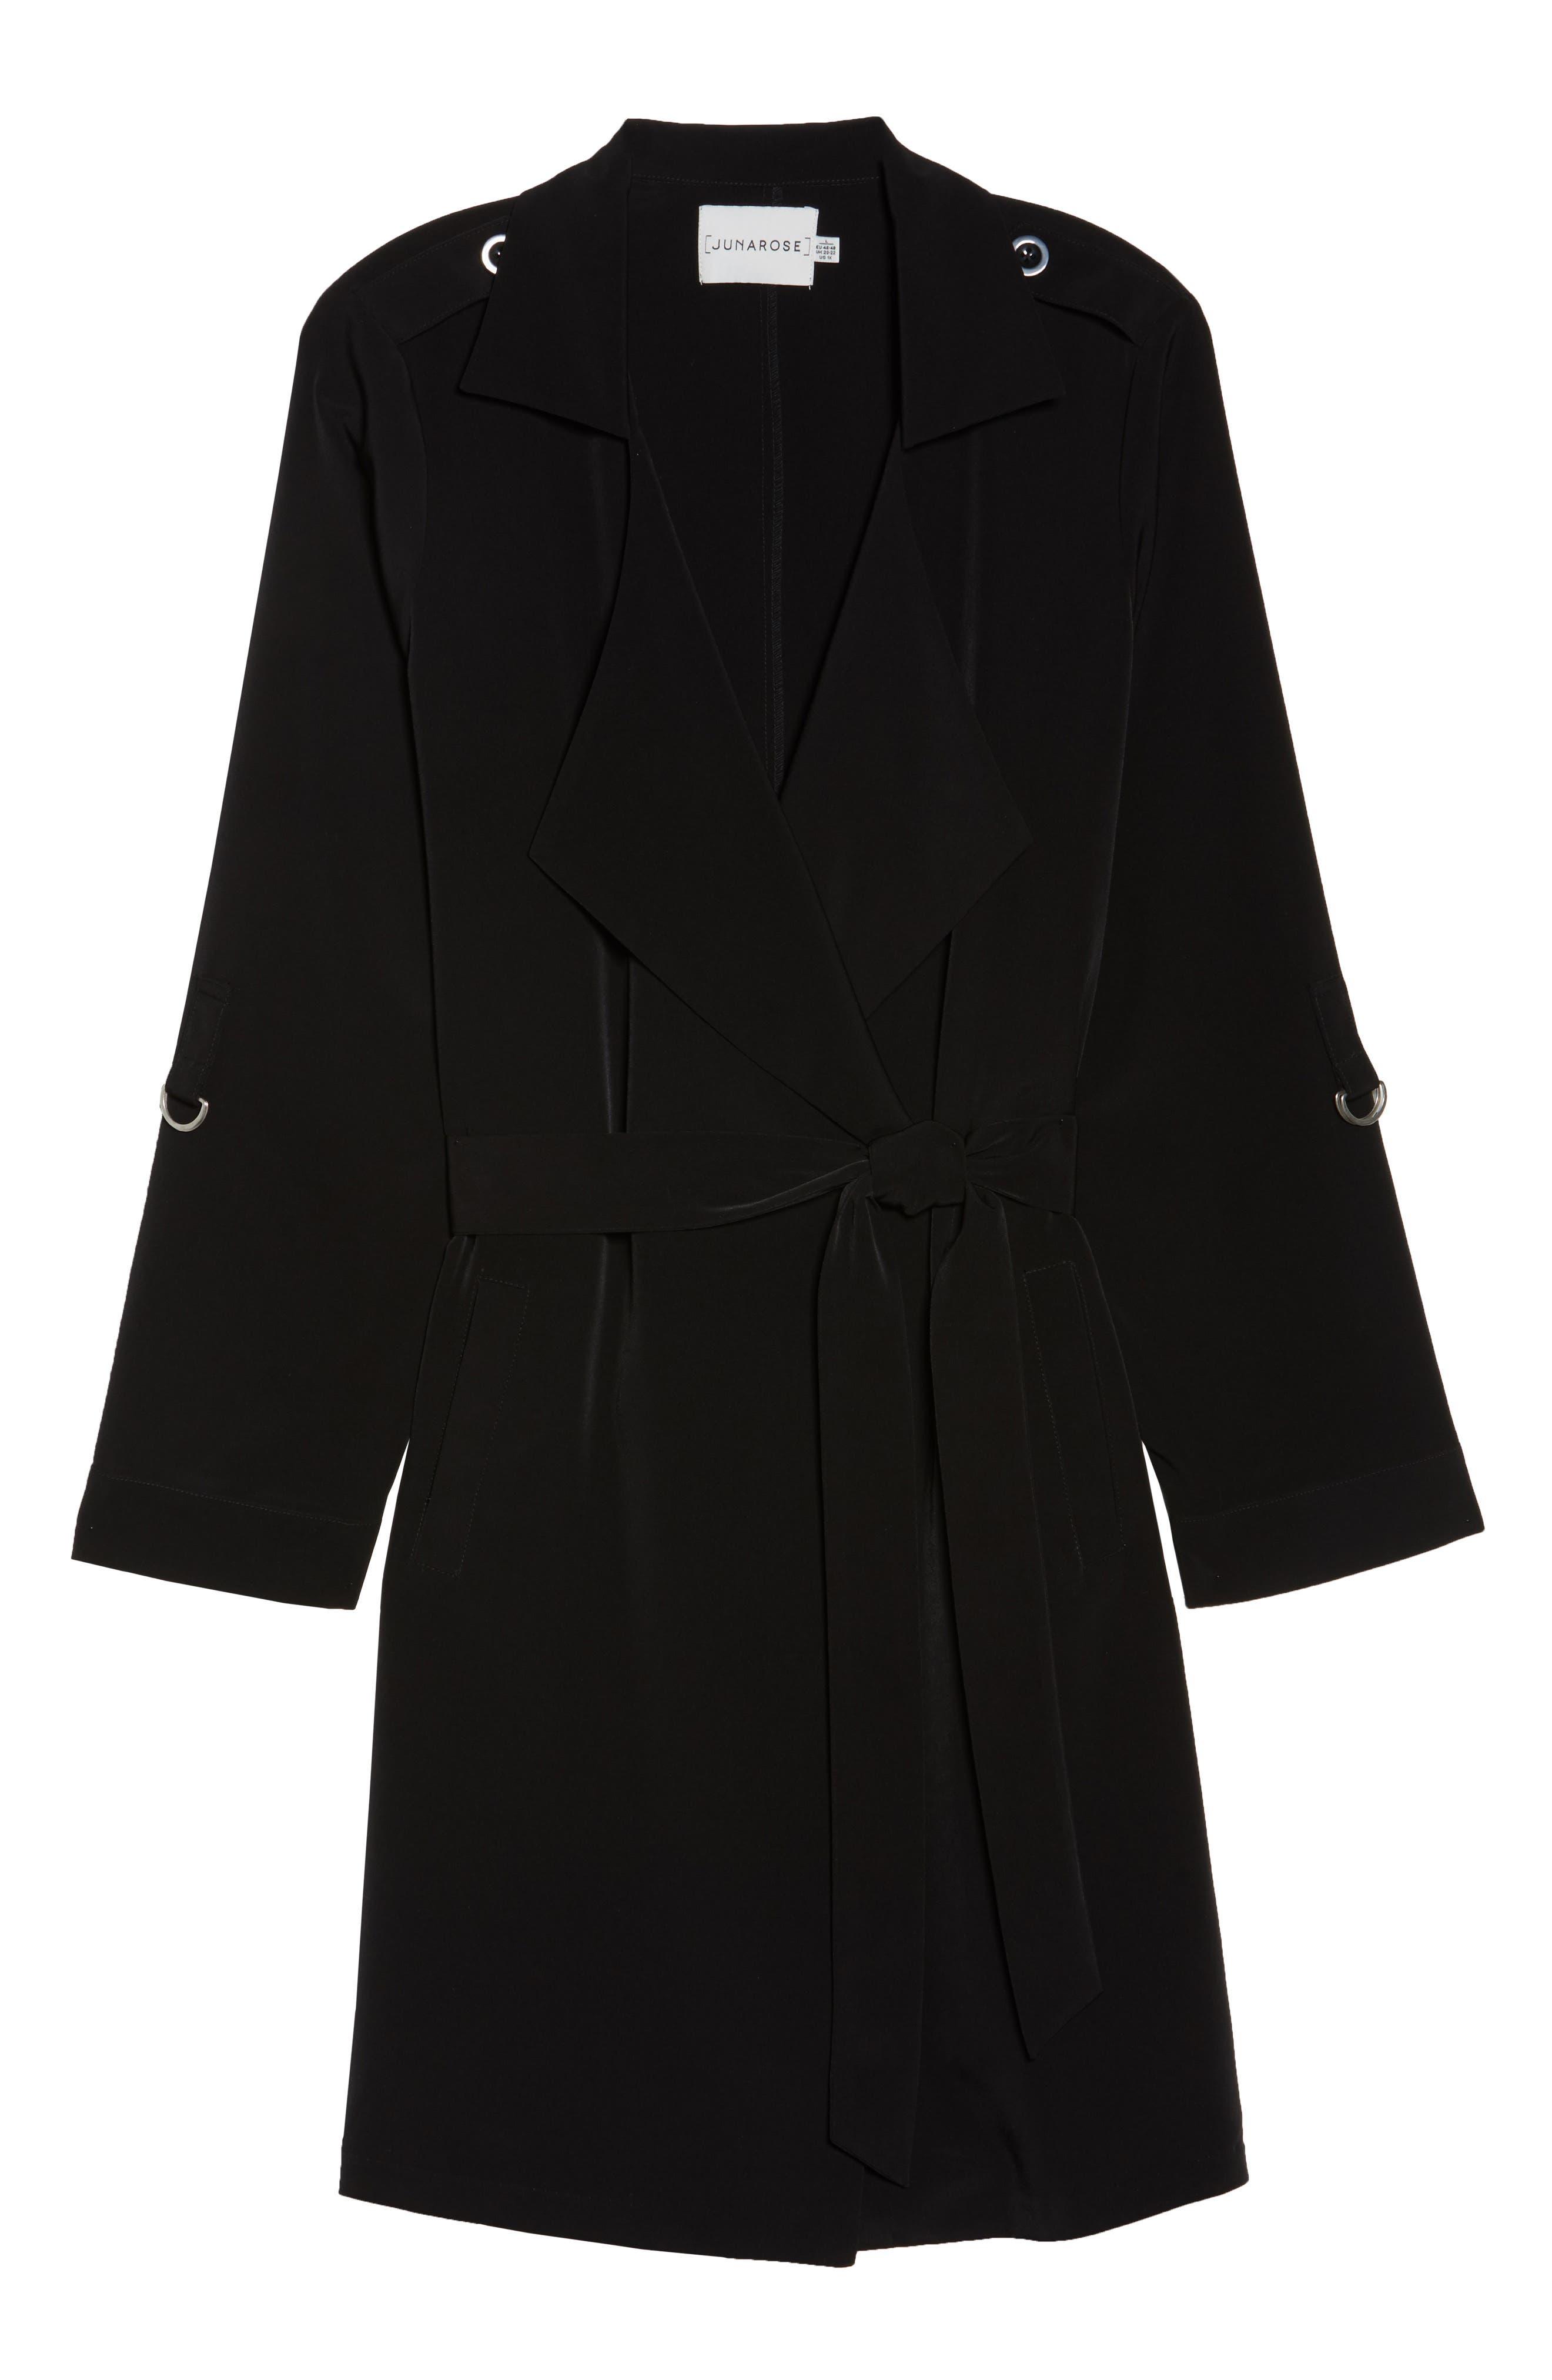 Kaiza Trench Coat,                             Alternate thumbnail 5, color,                             002